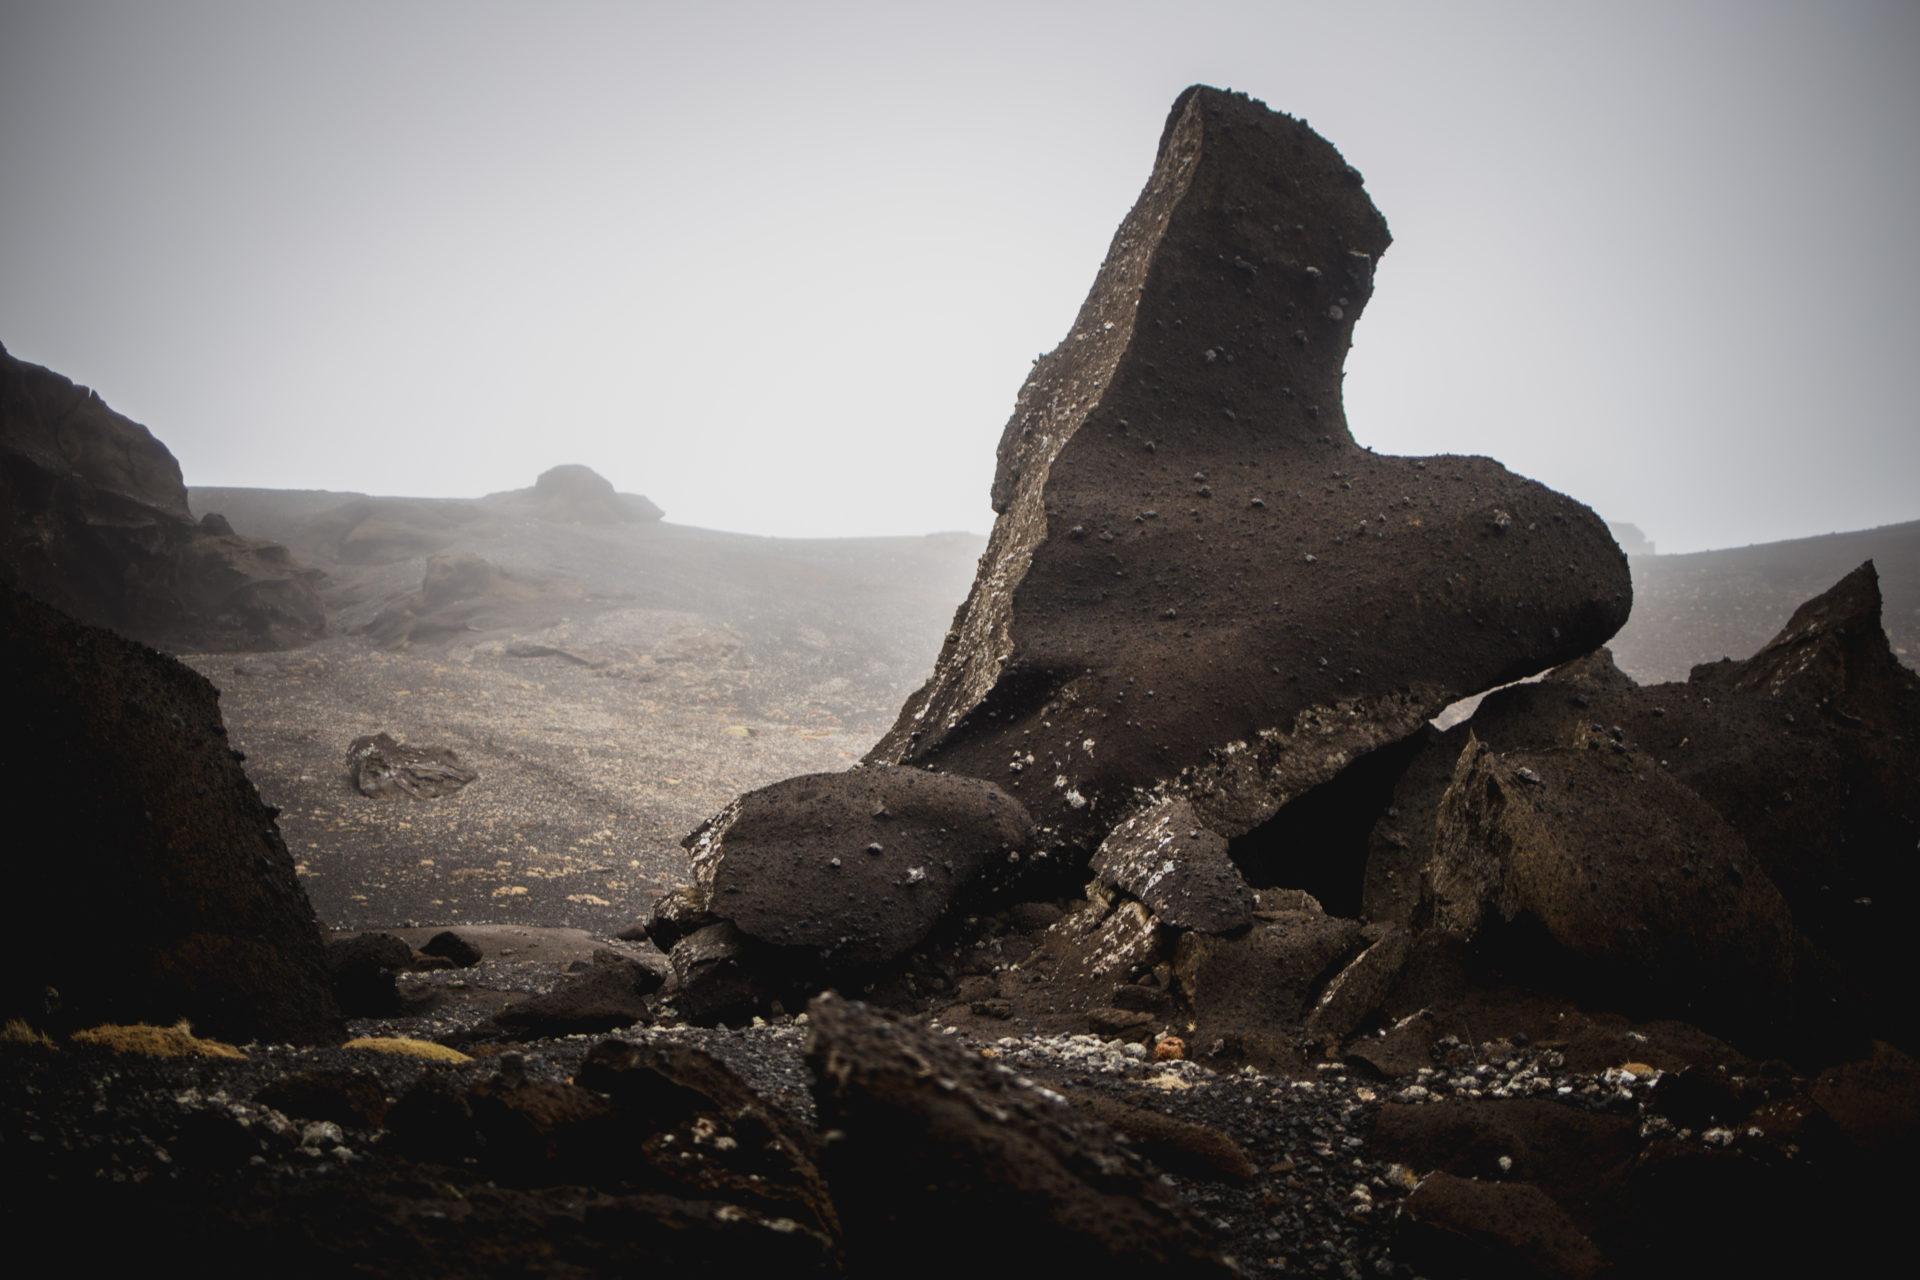 Island_Iceland_IMG_1400_Carolin-Weinkopf